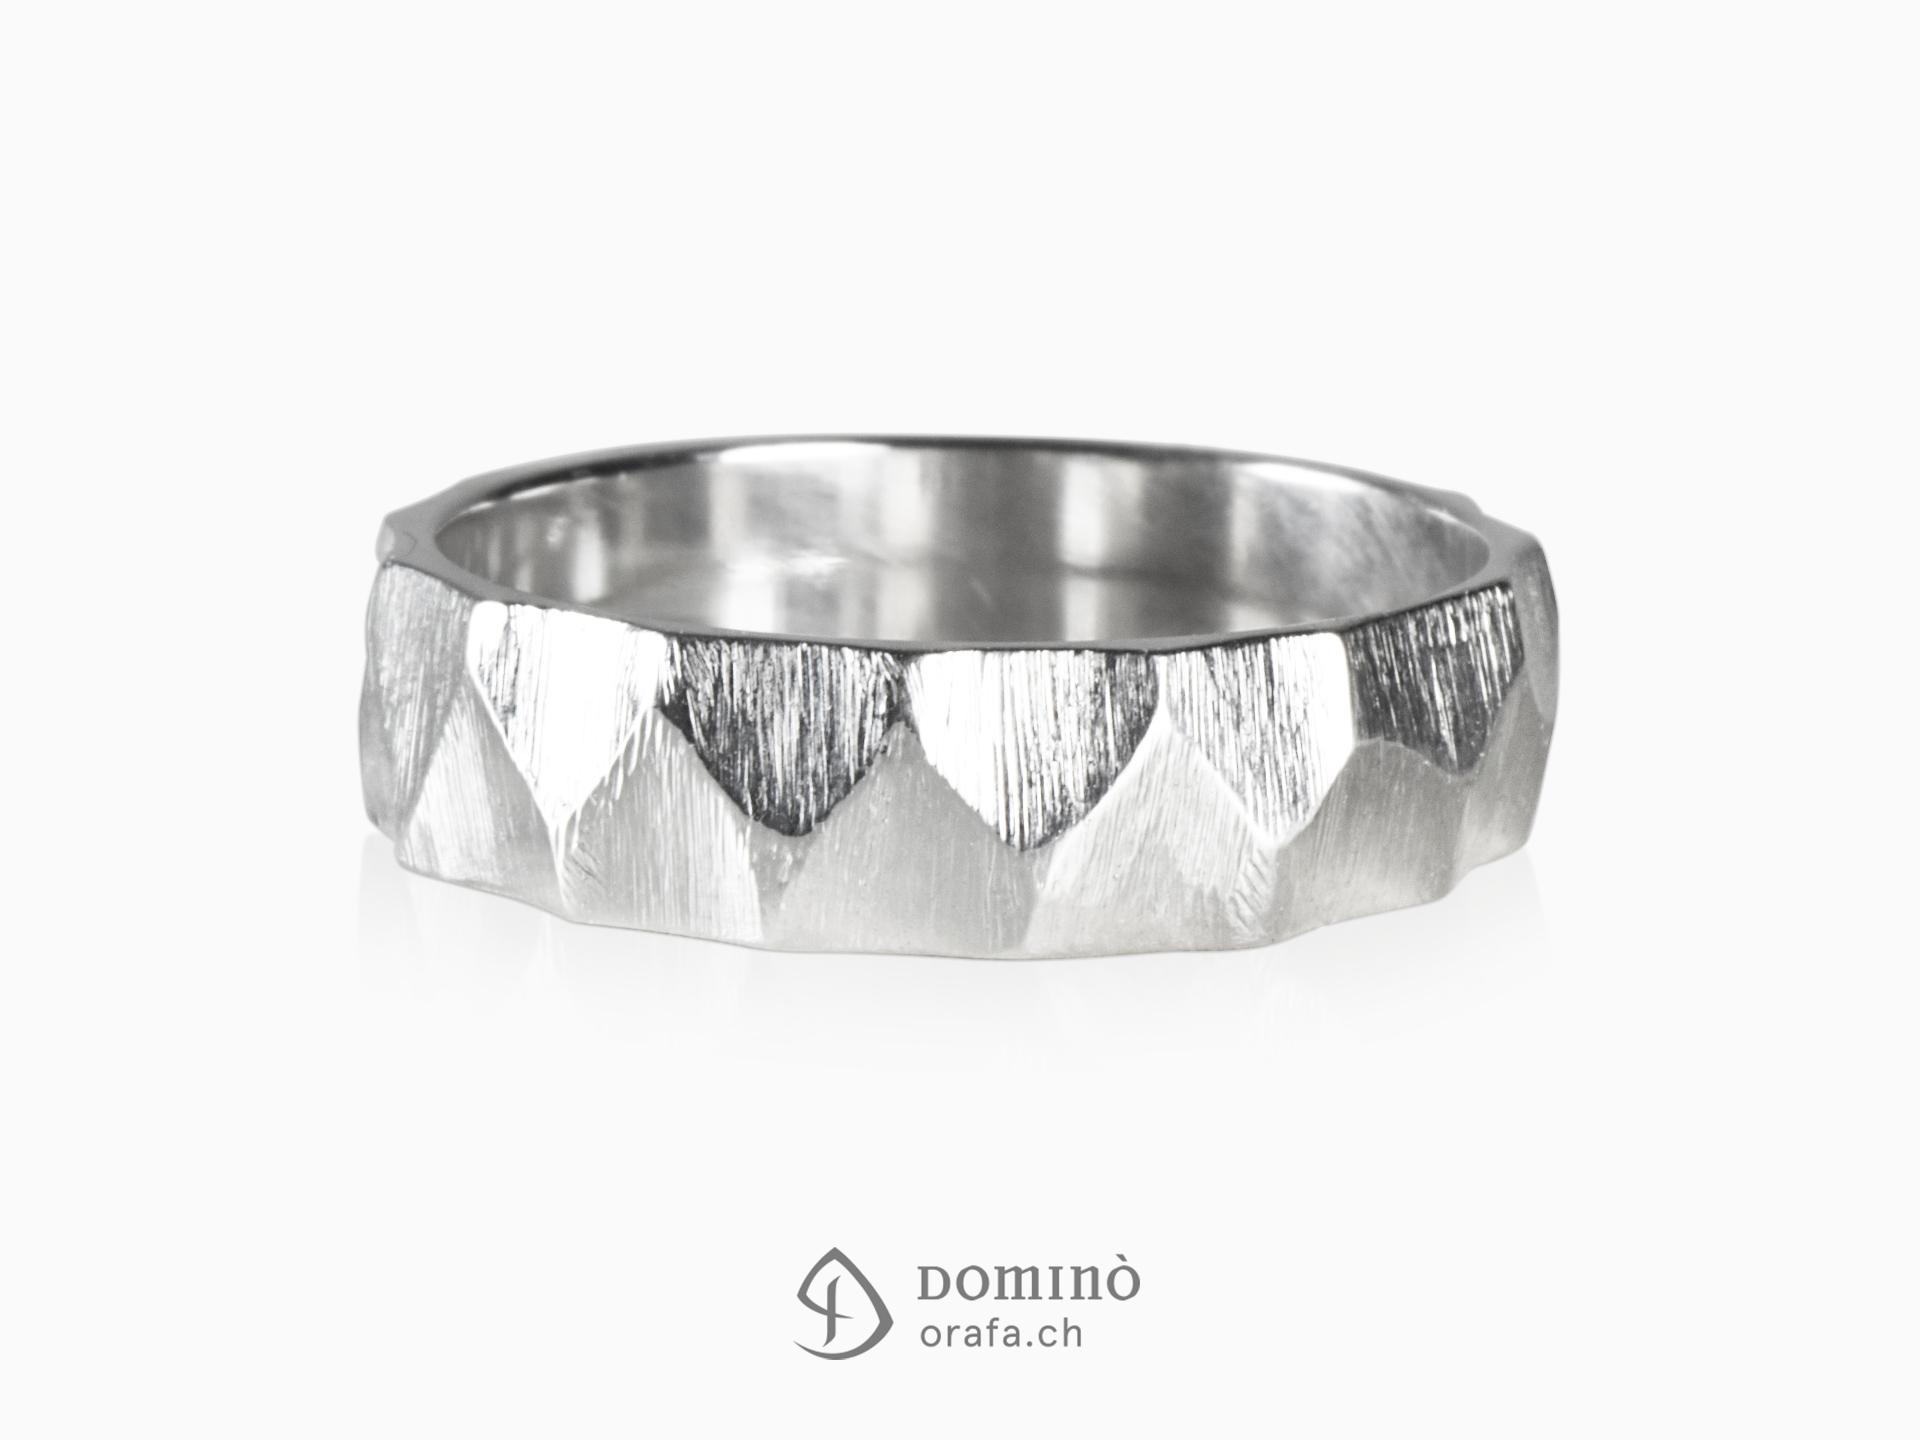 Zig-zag Sfaccettati rings